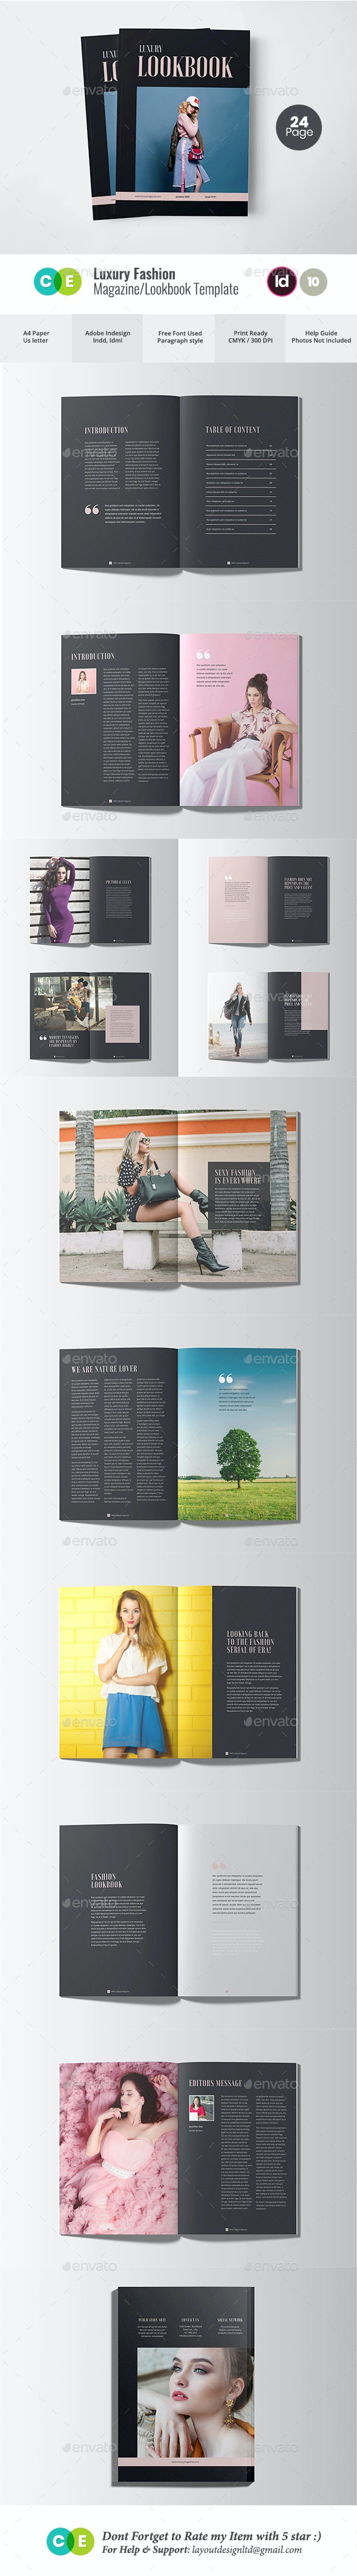 Luxury Fashion Magazine Lookbook V10 - Magazines Print Templates